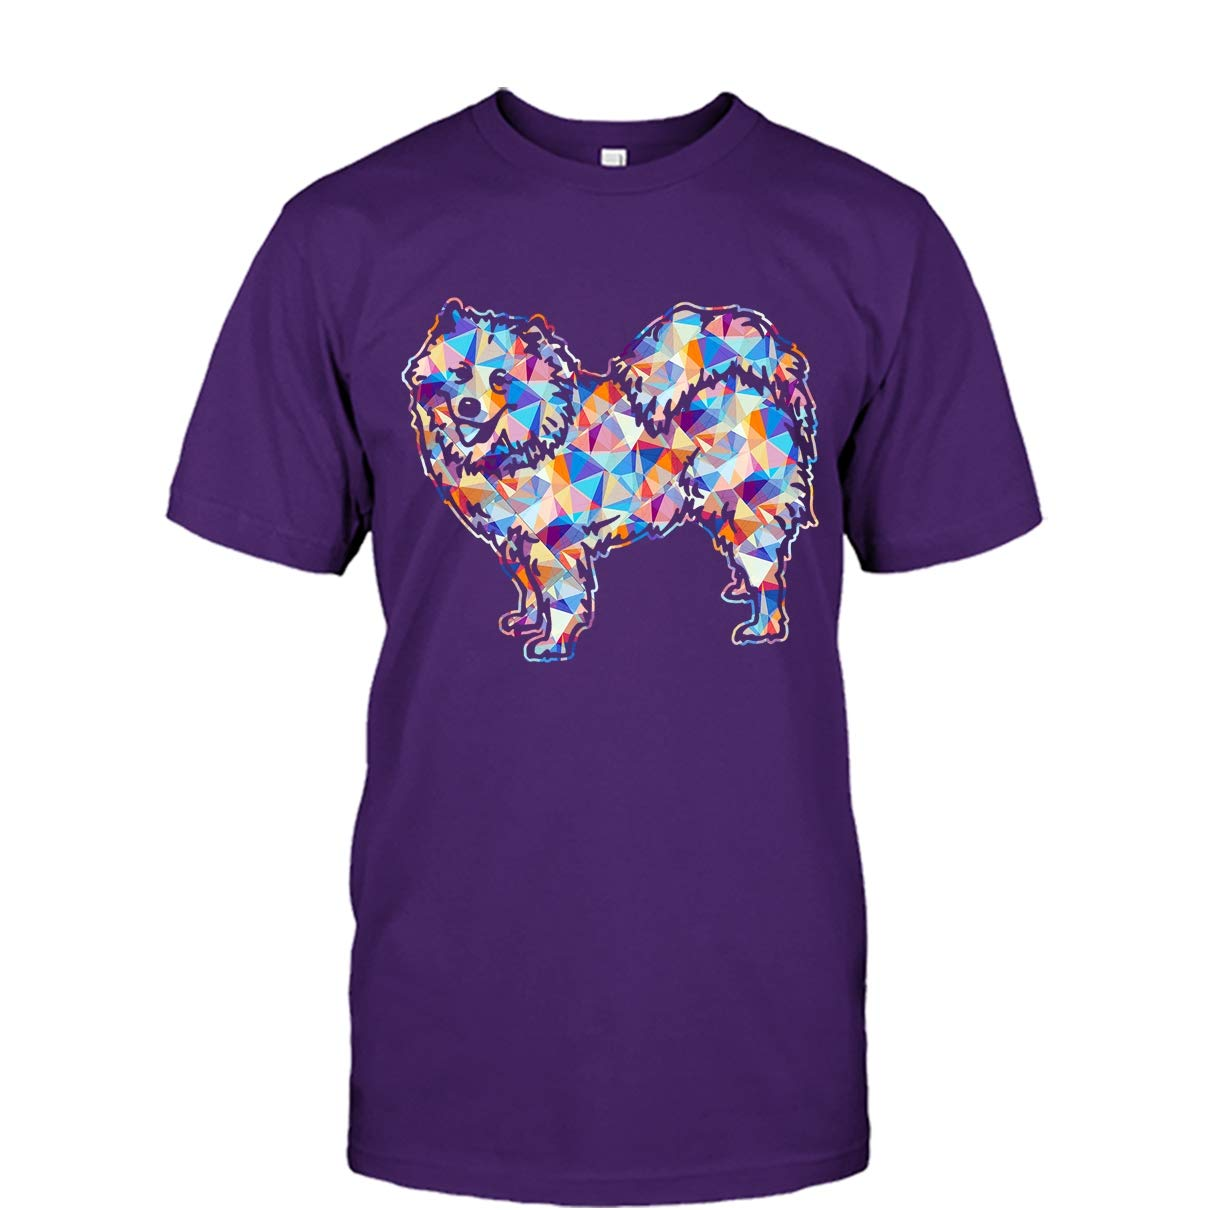 Samoyed Cool Tshirt Samoyed Geometric Colorful Tee Shirt Design for Men and Women